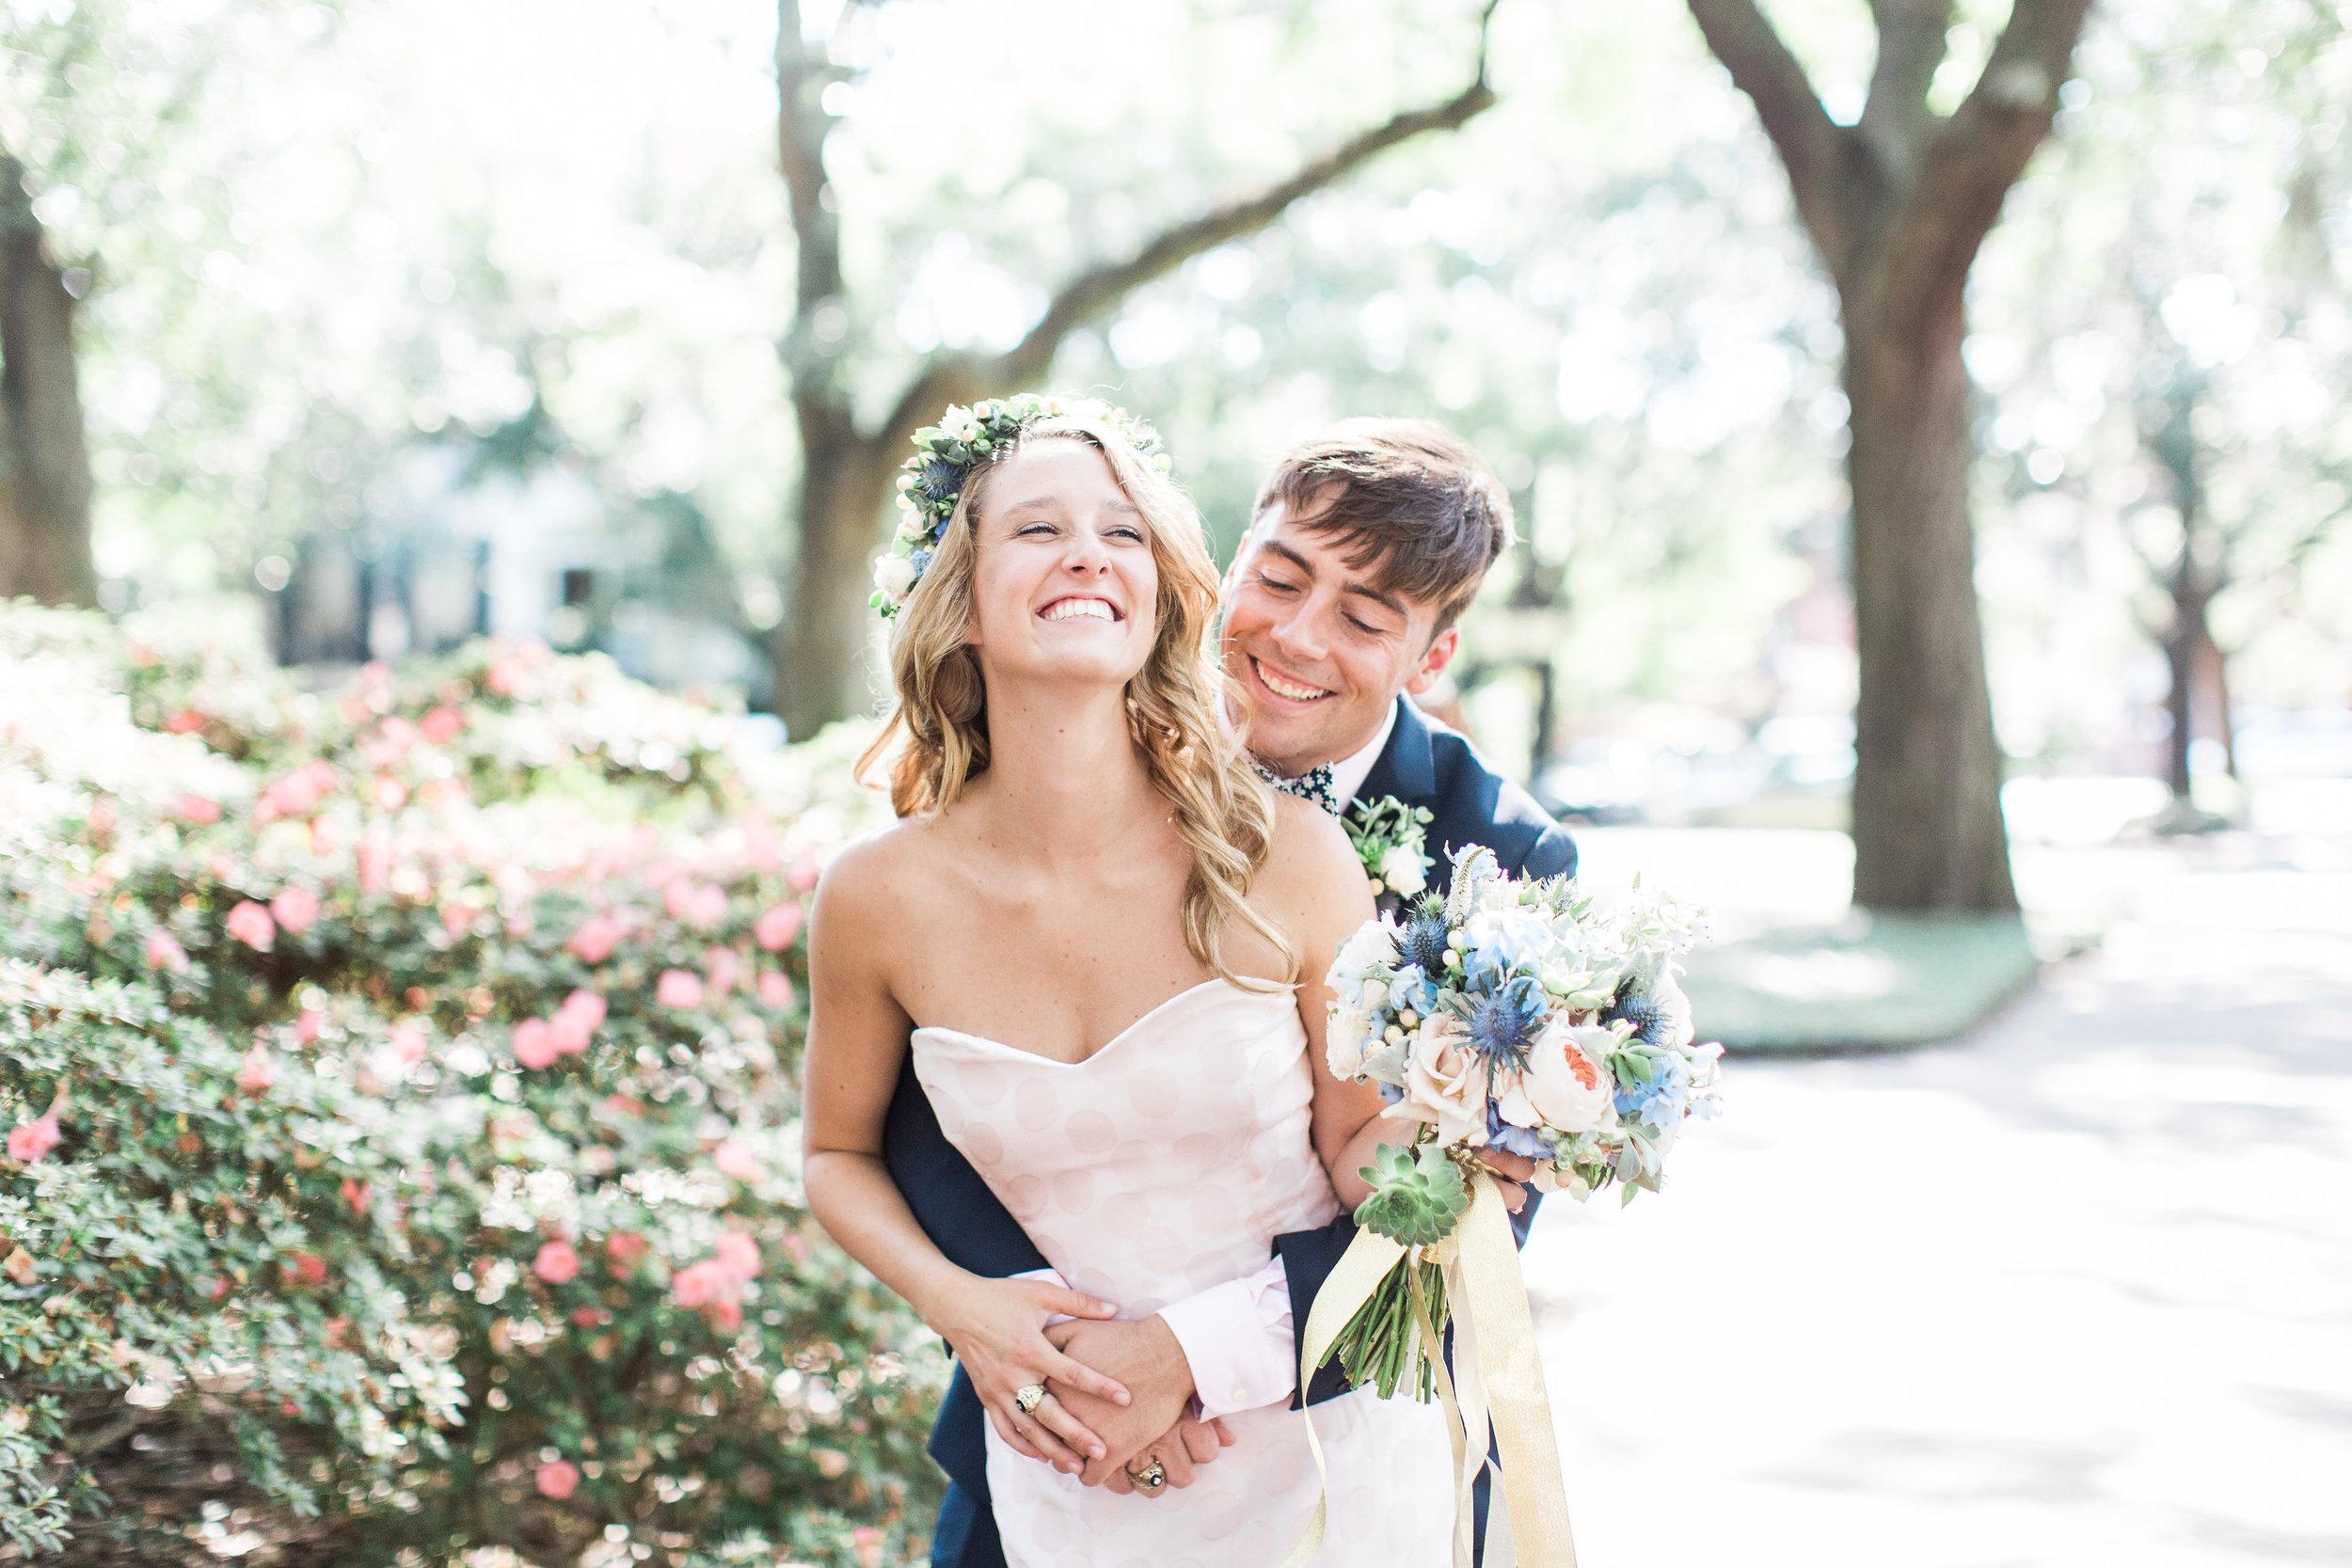 Eve & Patrick's Savannah wedding at Forsyth Park by Apt B Photography